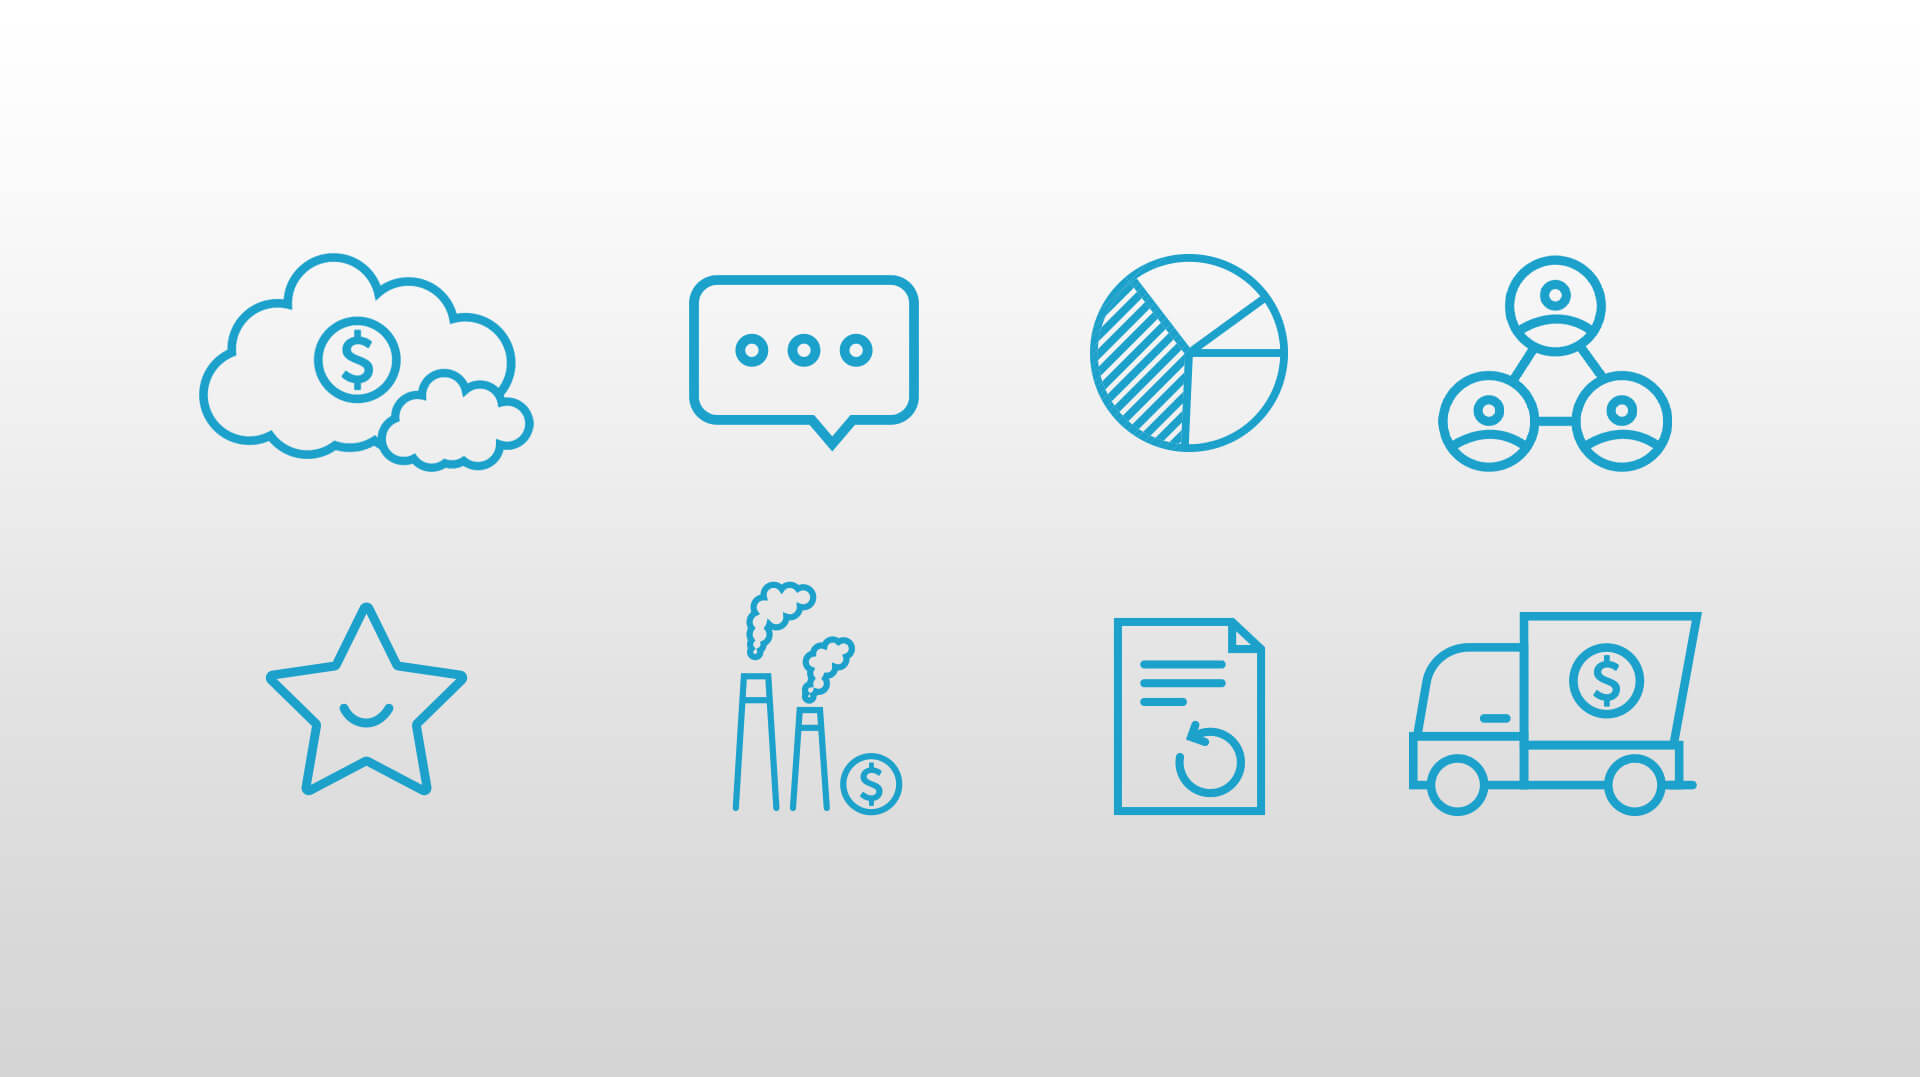 USS Global Brand Design - Icon Design